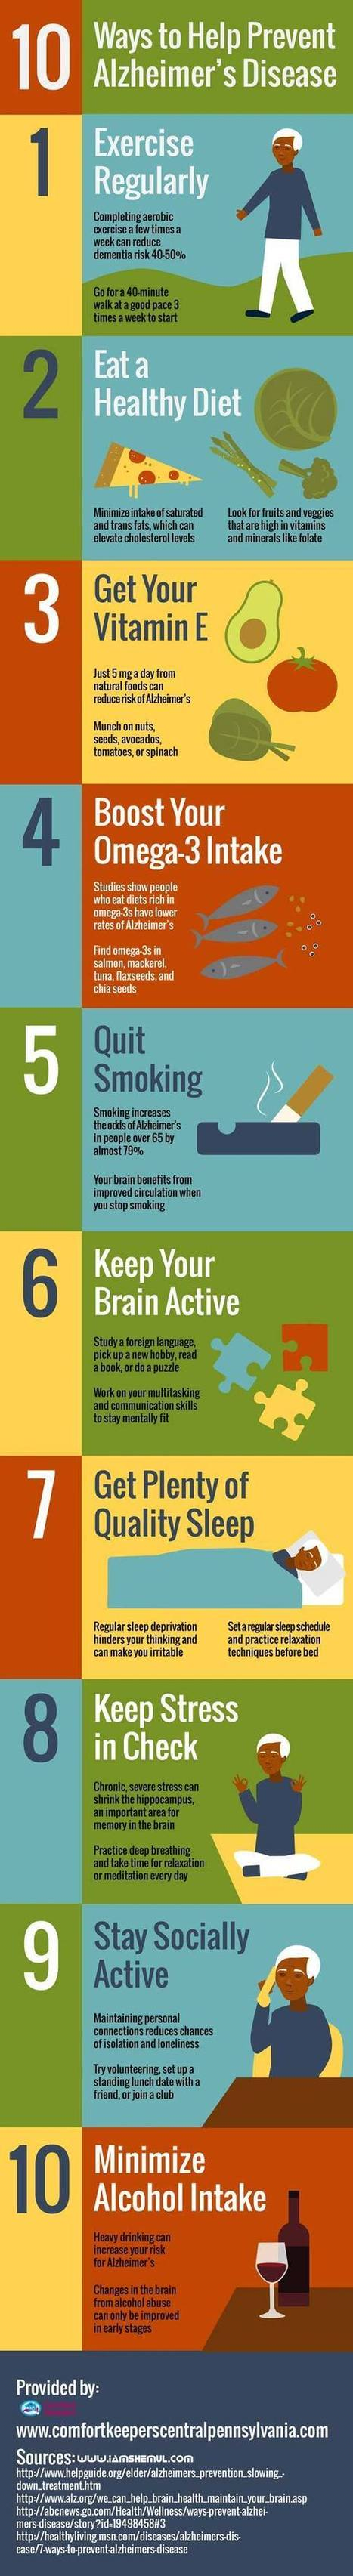 How To Prevent Alzheimer's Disease 10 Best Ways [infographic]   Internet   Scoop.it